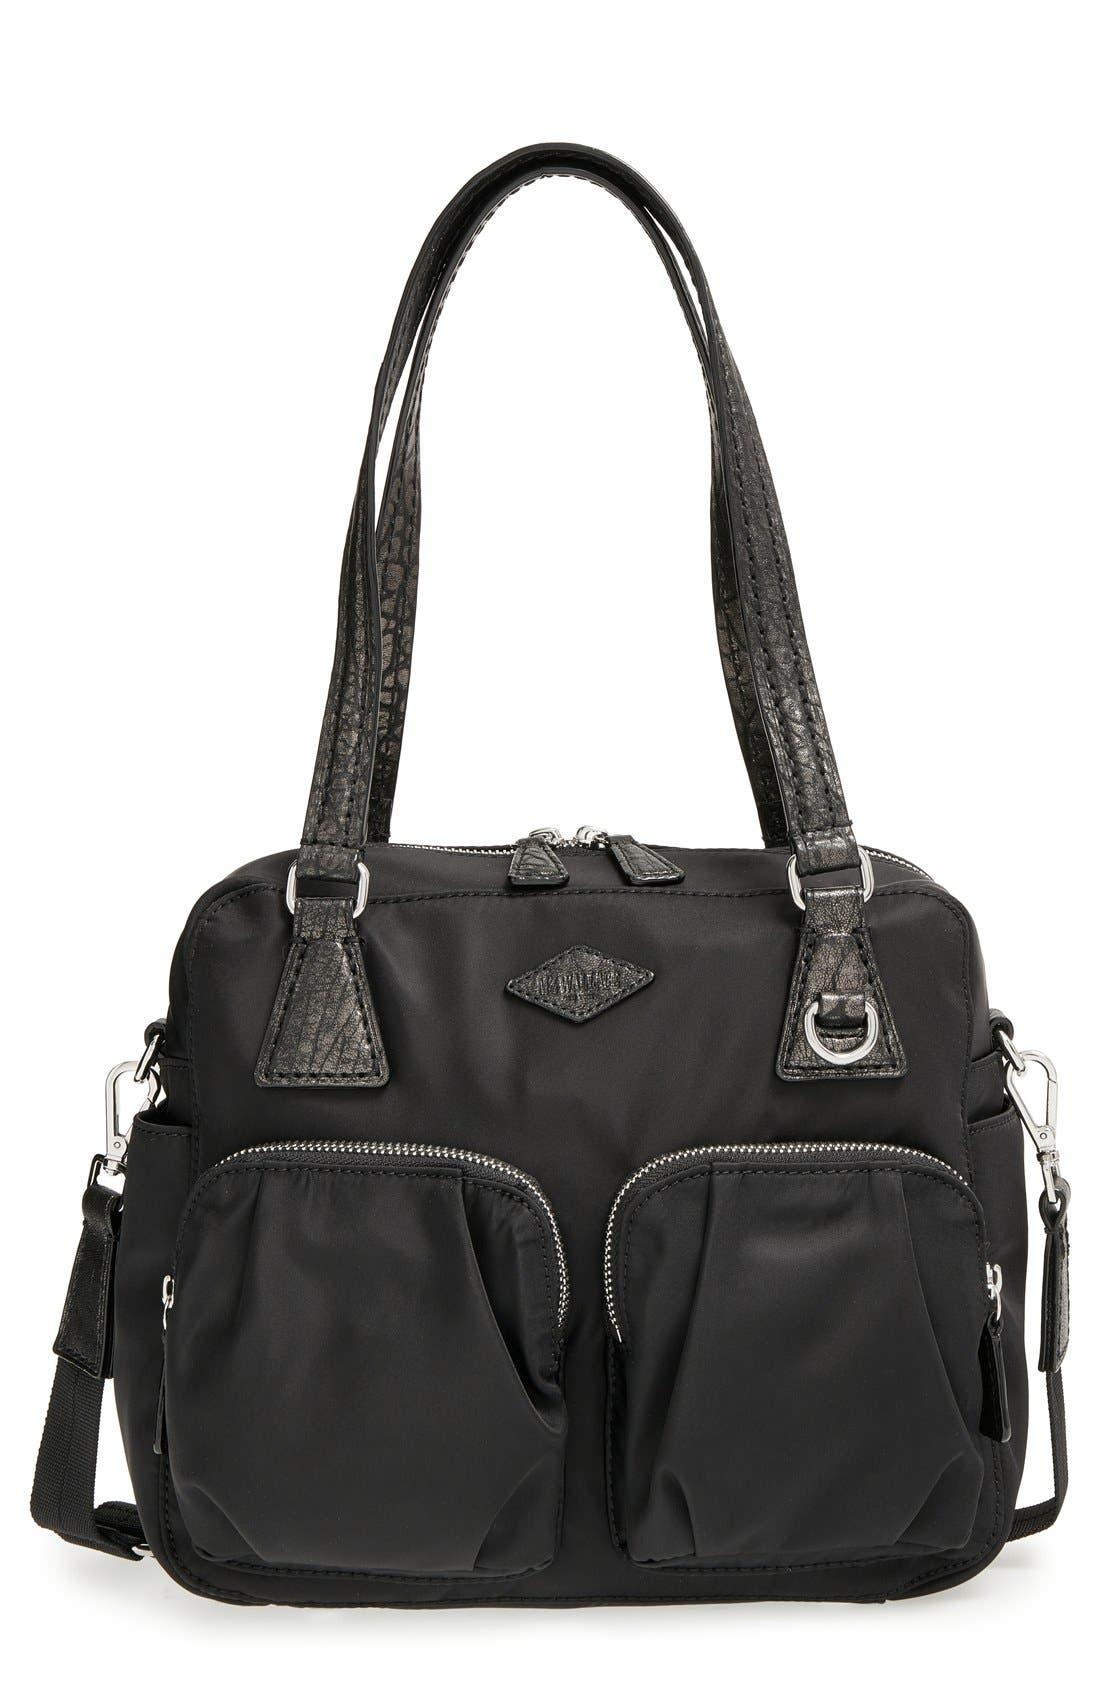 'Small Roxy' Bedford Nylon Shoulder Bag,                             Main thumbnail 1, color,                             001